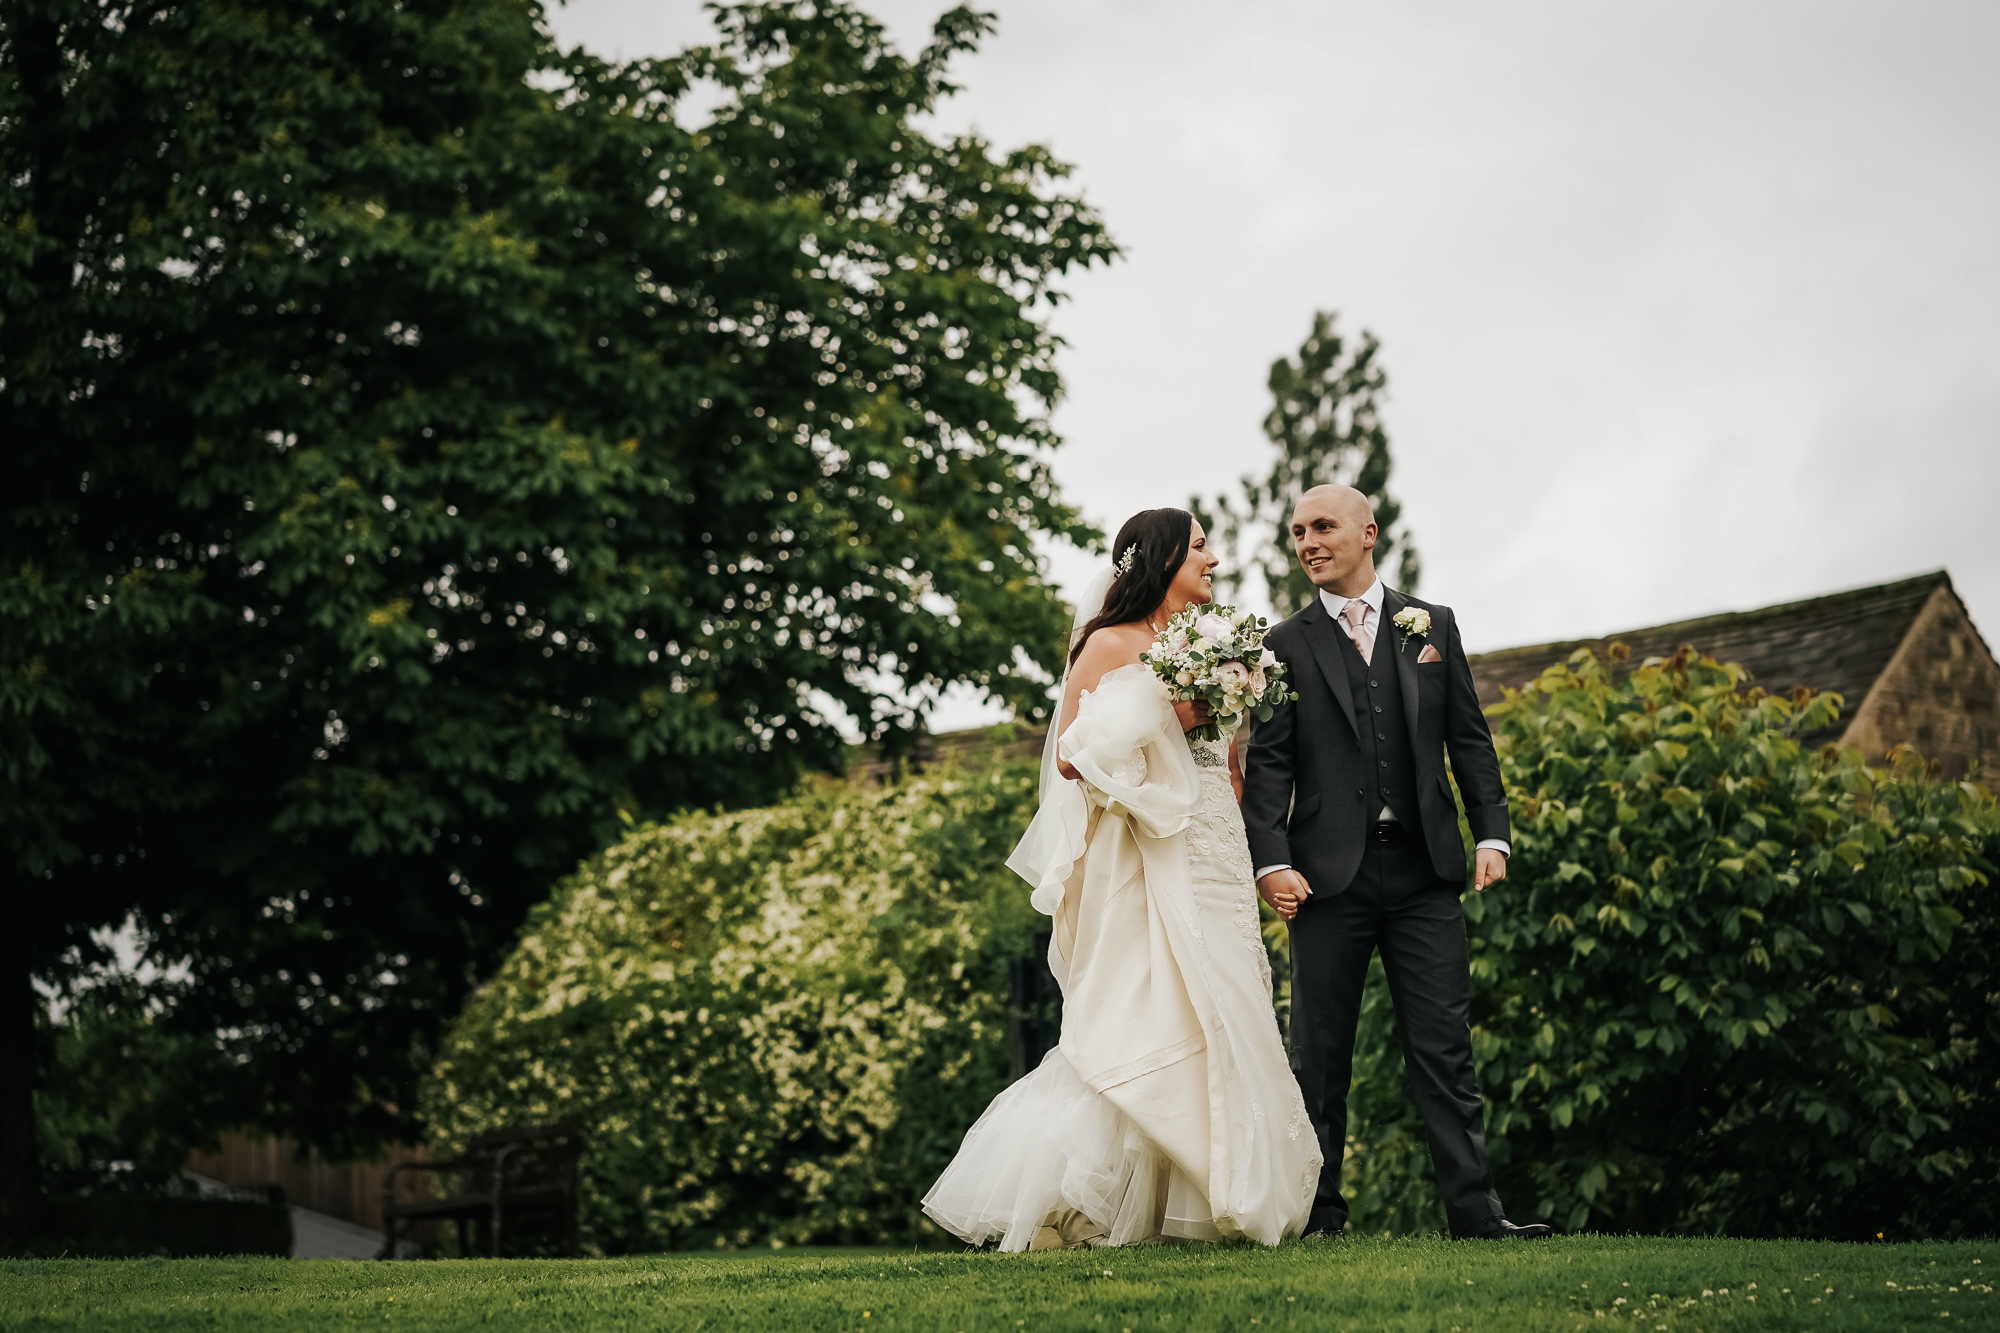 Hyde Bank Farm Wedding Photography Manchester wedding photographer (41 of 49).jpg